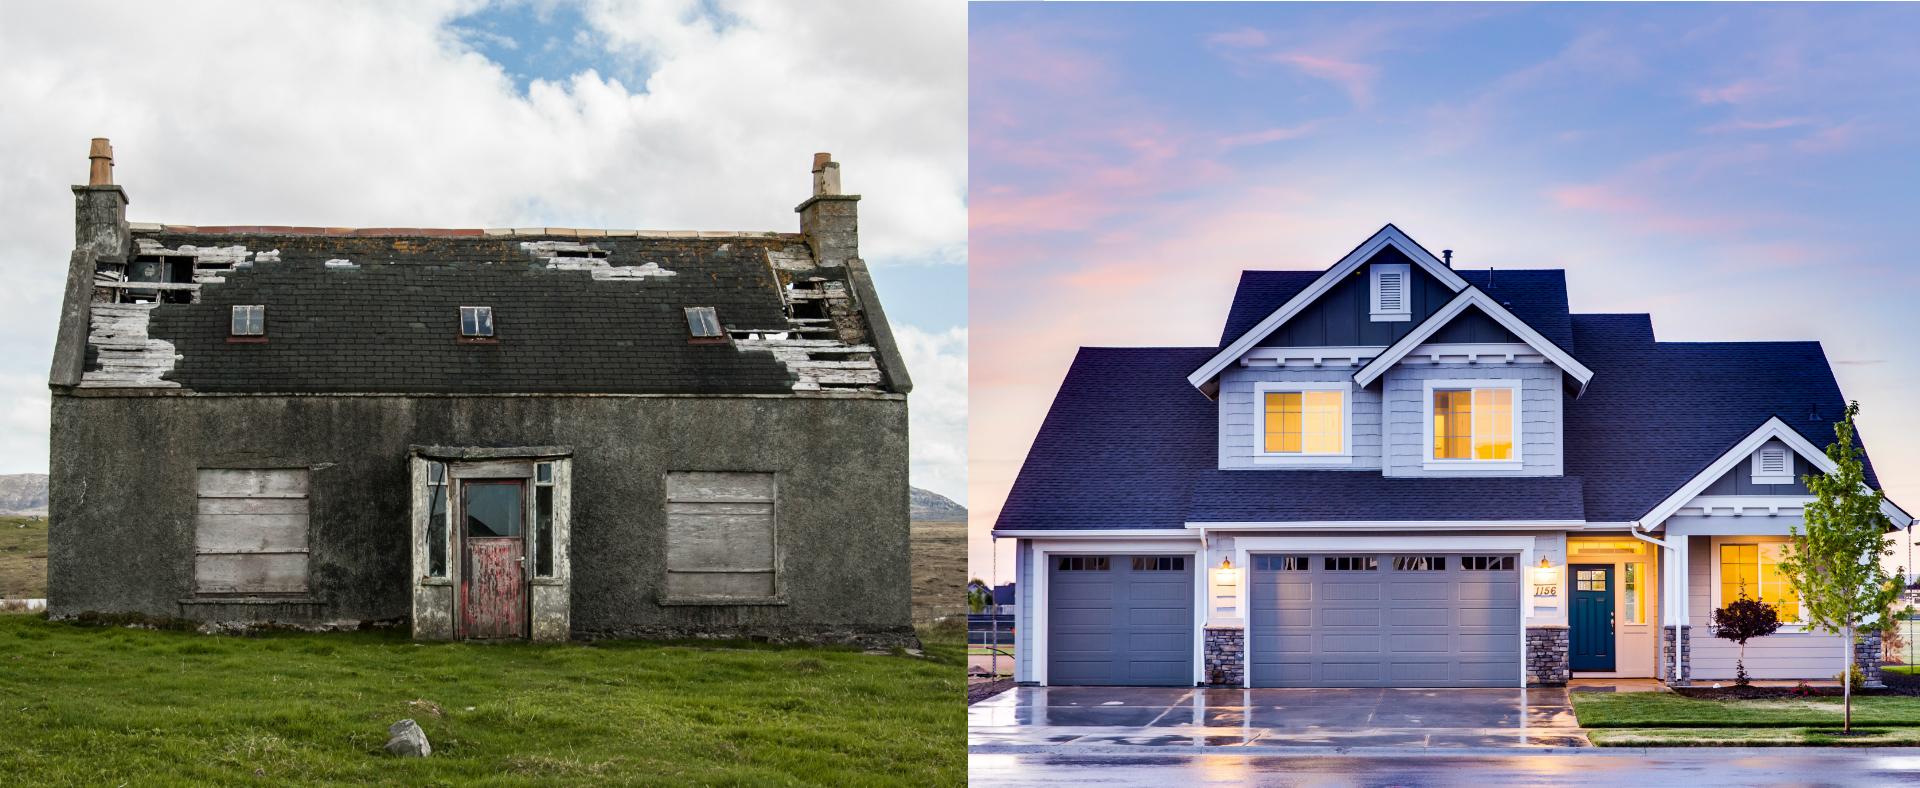 Home - Home Builders & Remodelers ociation of Maine House Remodelers on house painting, house dealer, house plumbing, house architecture, house architect, house hvac, house demolition,